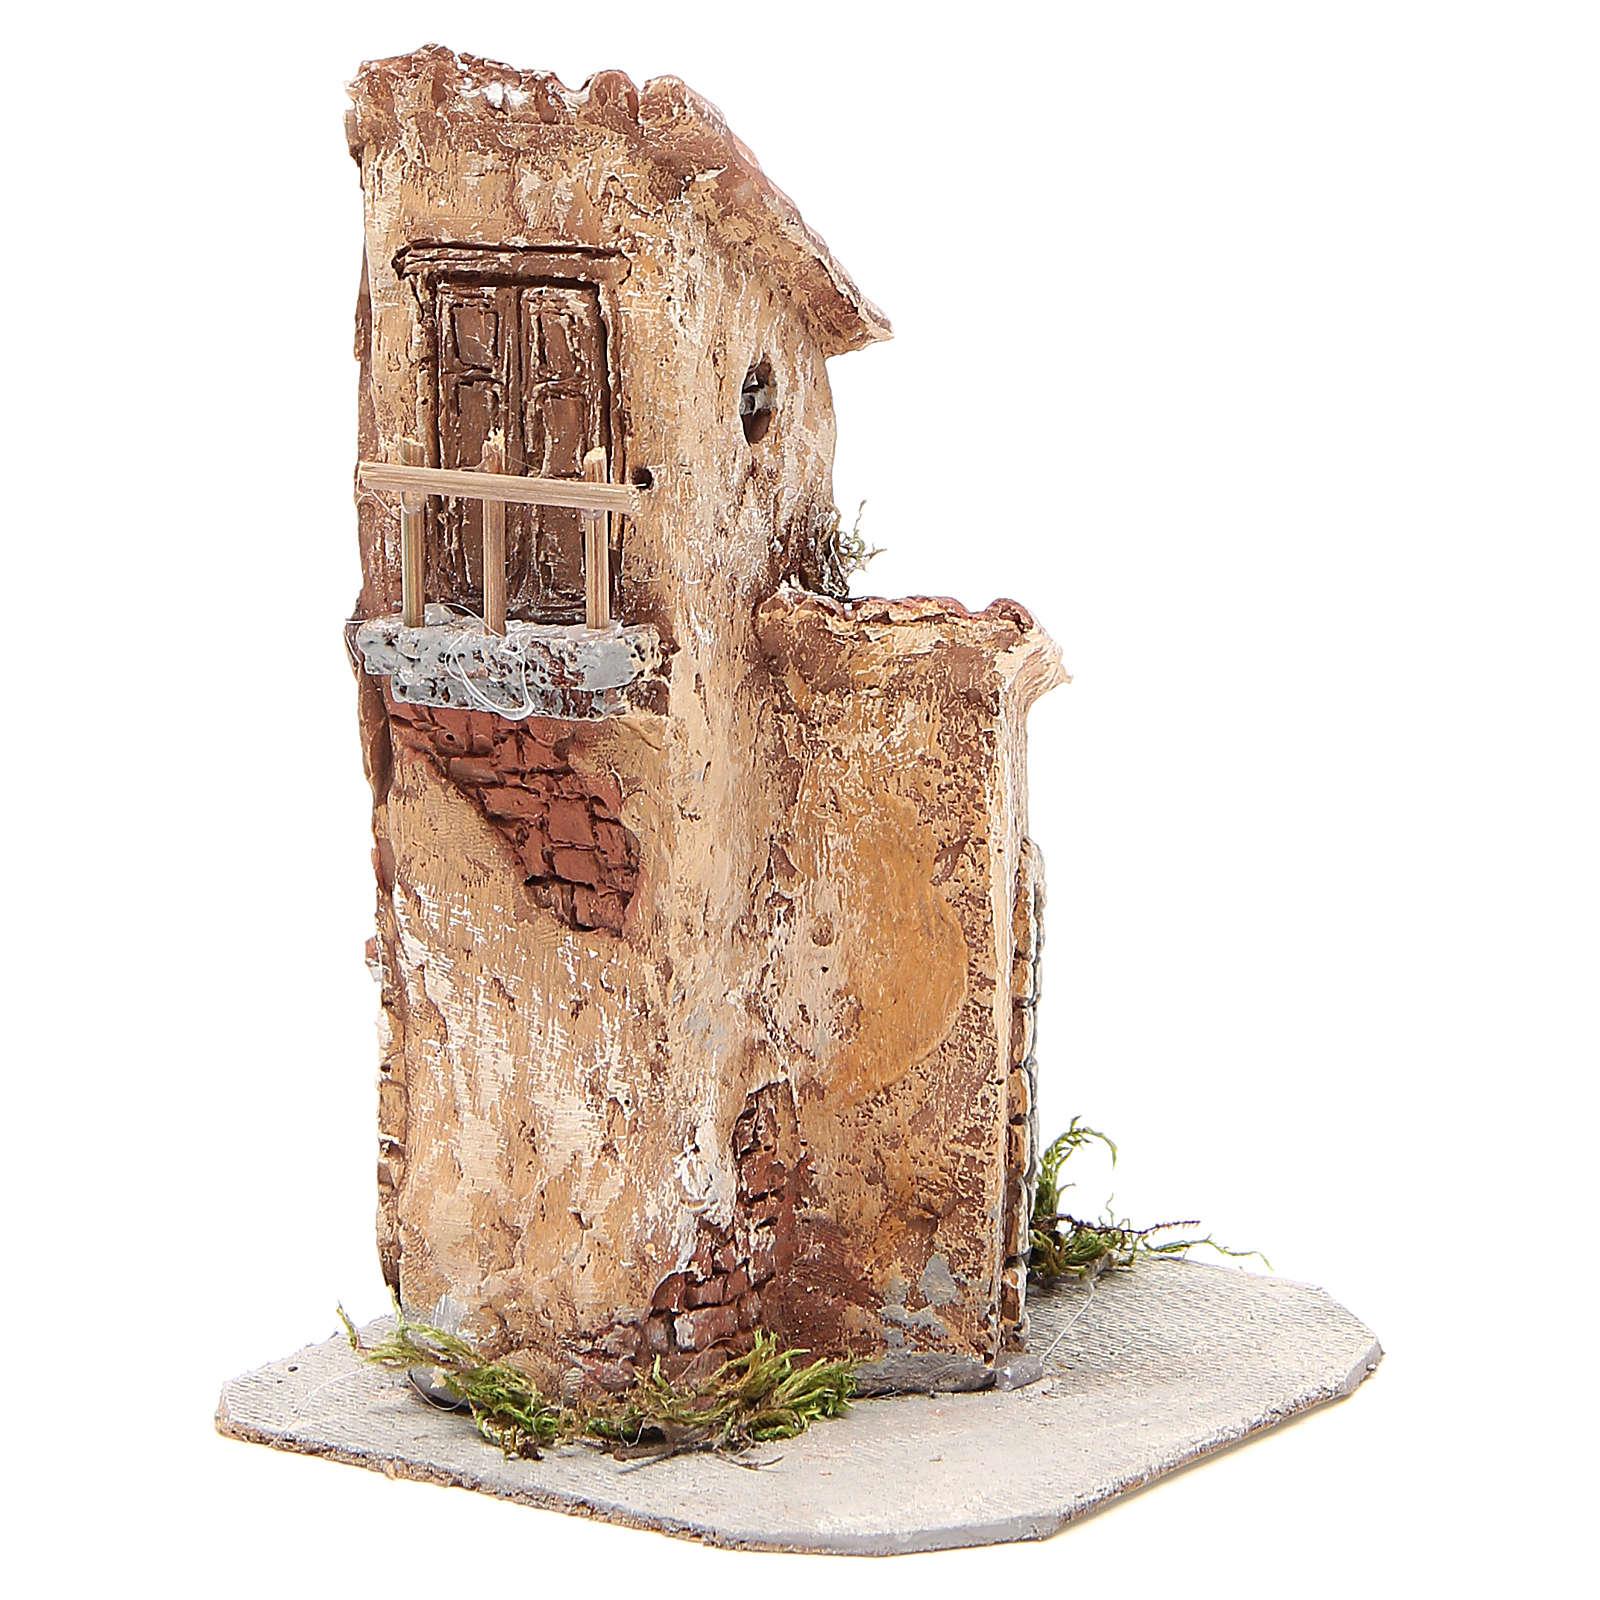 Casa resina y madera belén Nápoles 22x12x12 cm 4